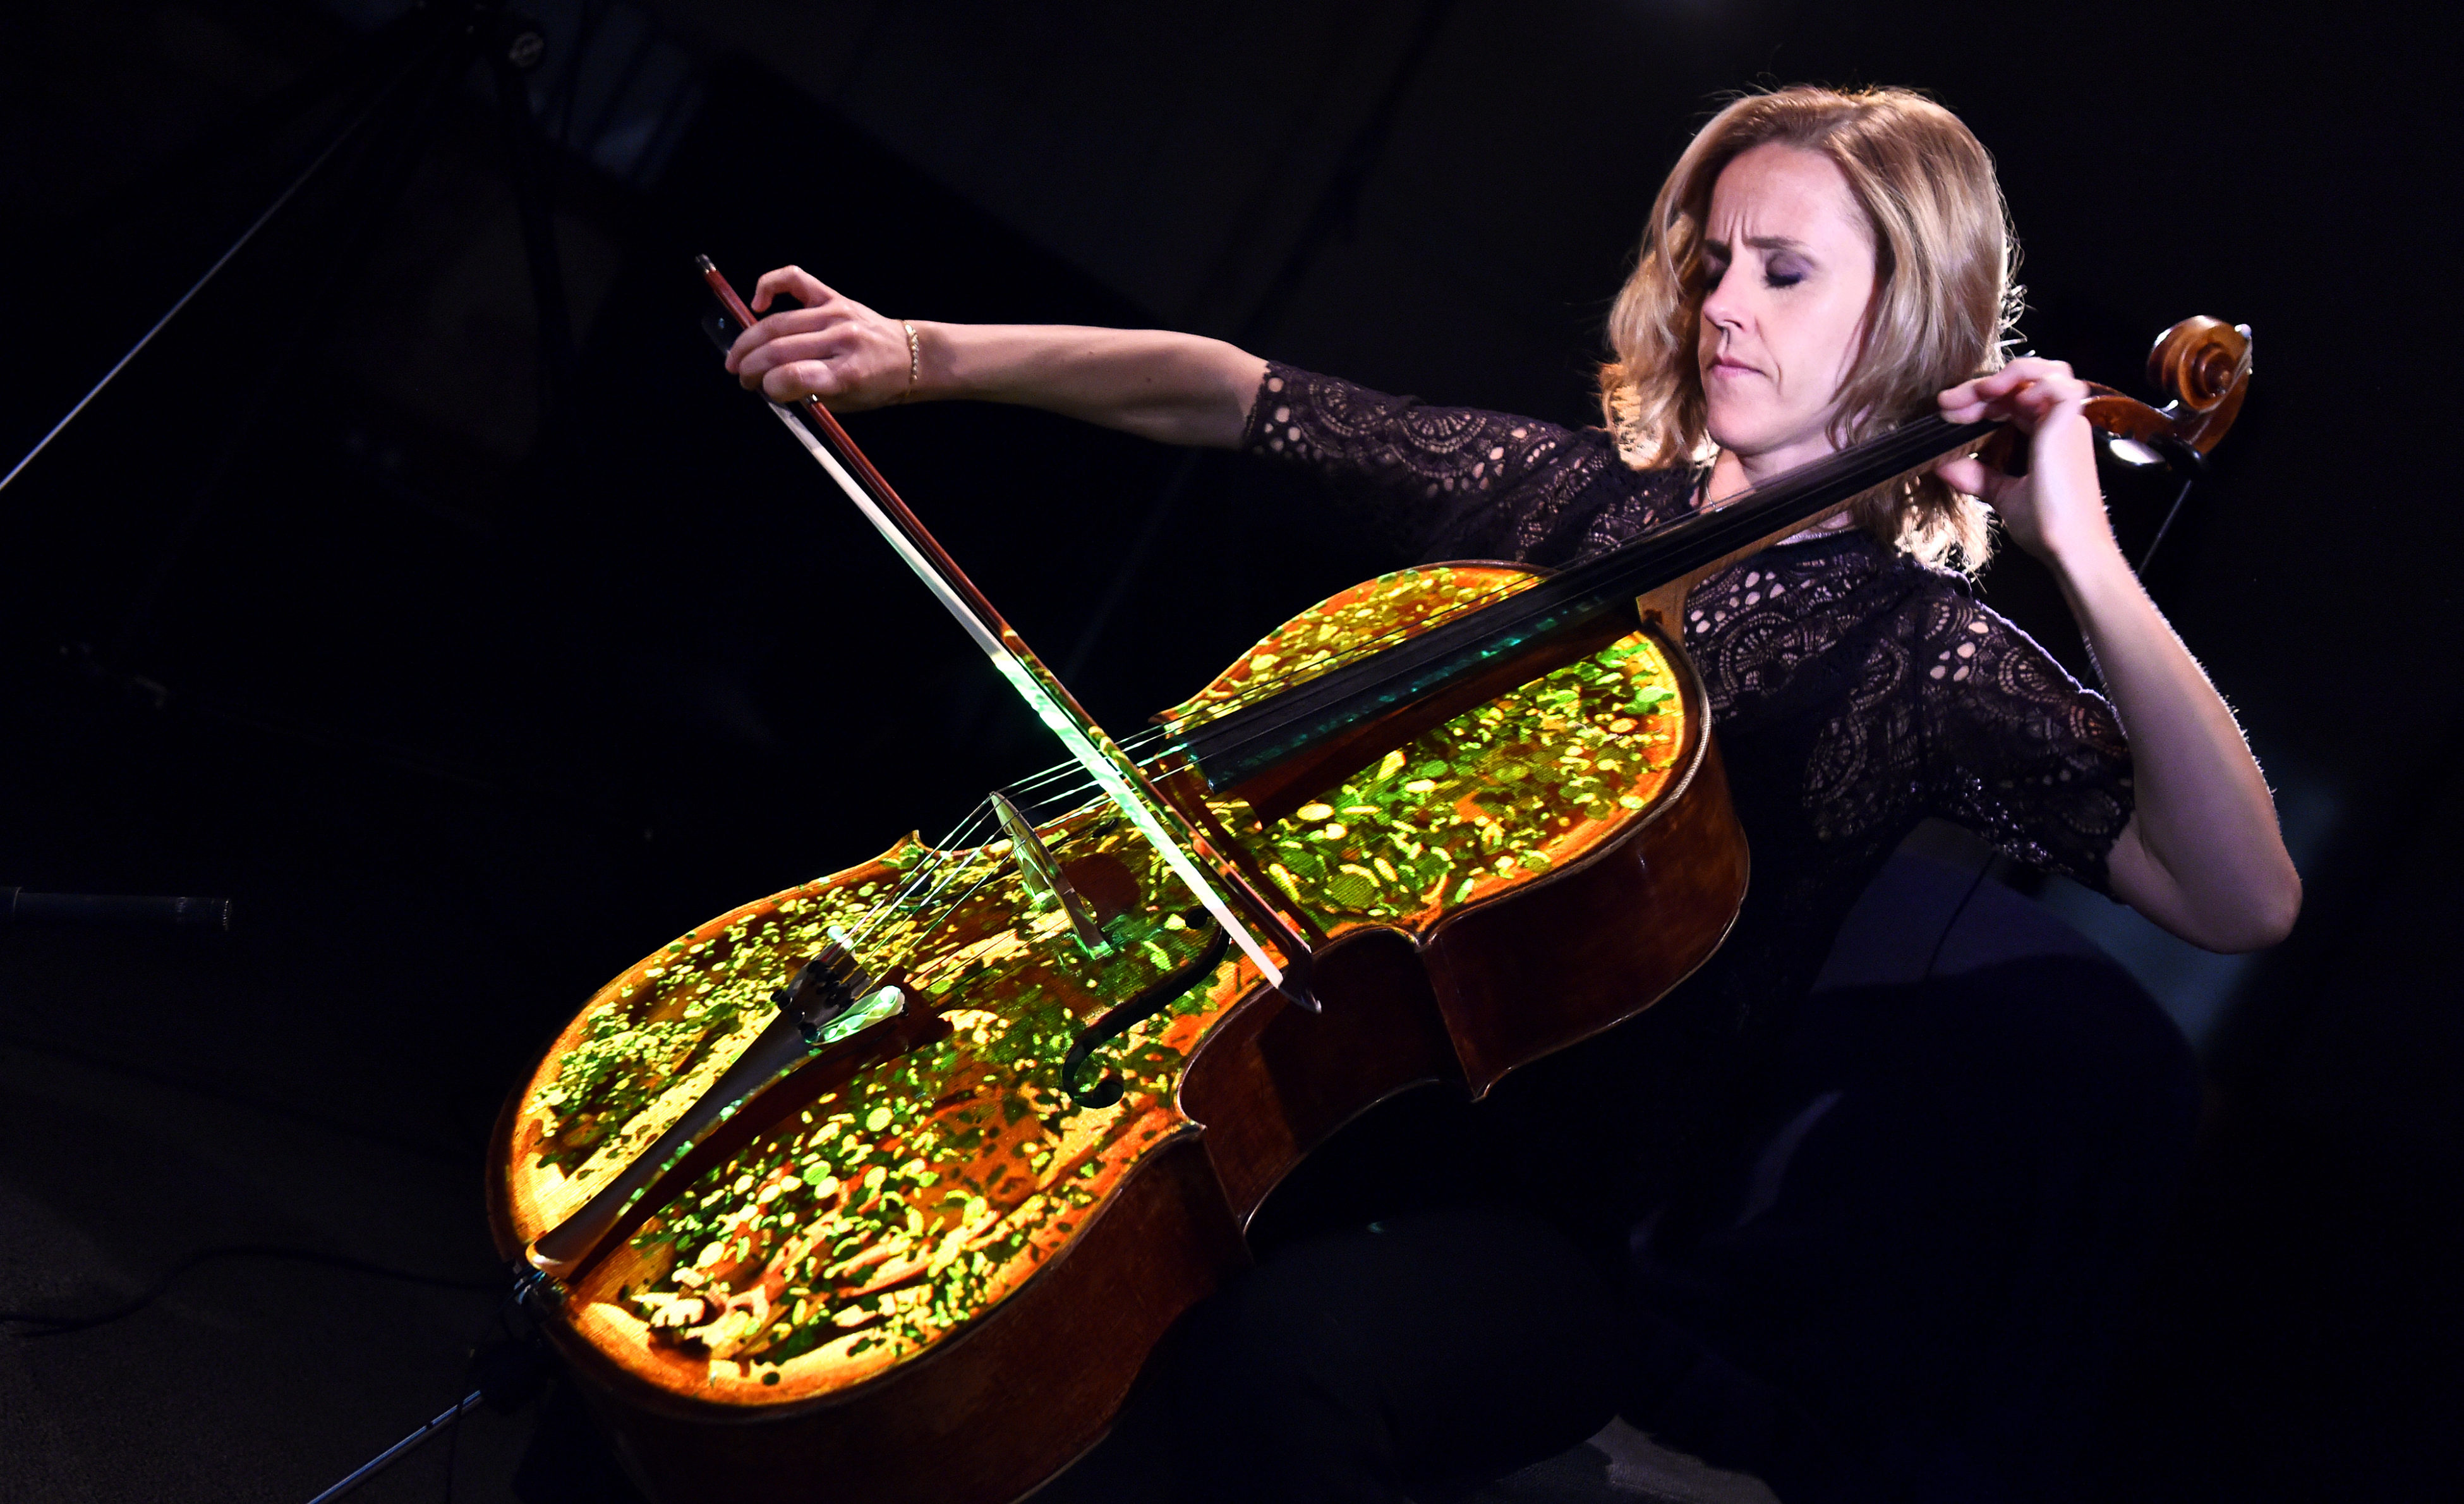 Sol Gabetta performs Elgar's Cello Concerto as part of Cello The Movie for BBC Proms 2016. Loftus Media Photographer: Sarah Jeynes. © BBC.